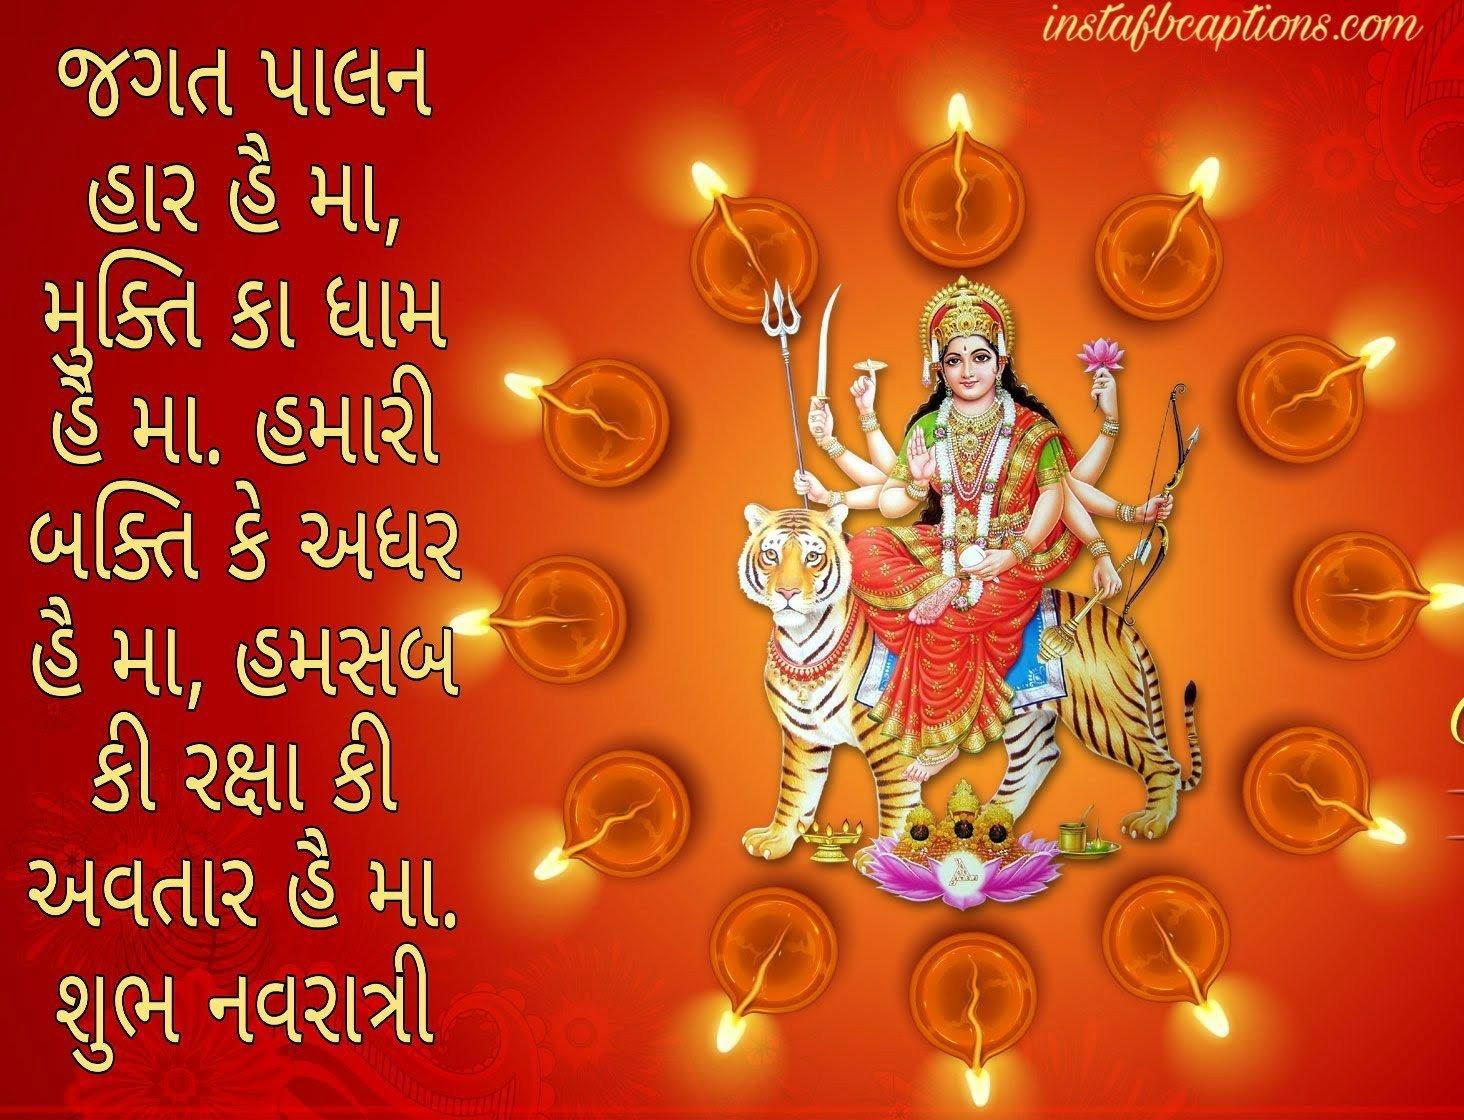 Gujarati Navratri Captions   - PicsArt 07 03 08 - 120+ Navratri Quotes, Wishes, and Instagram Captions